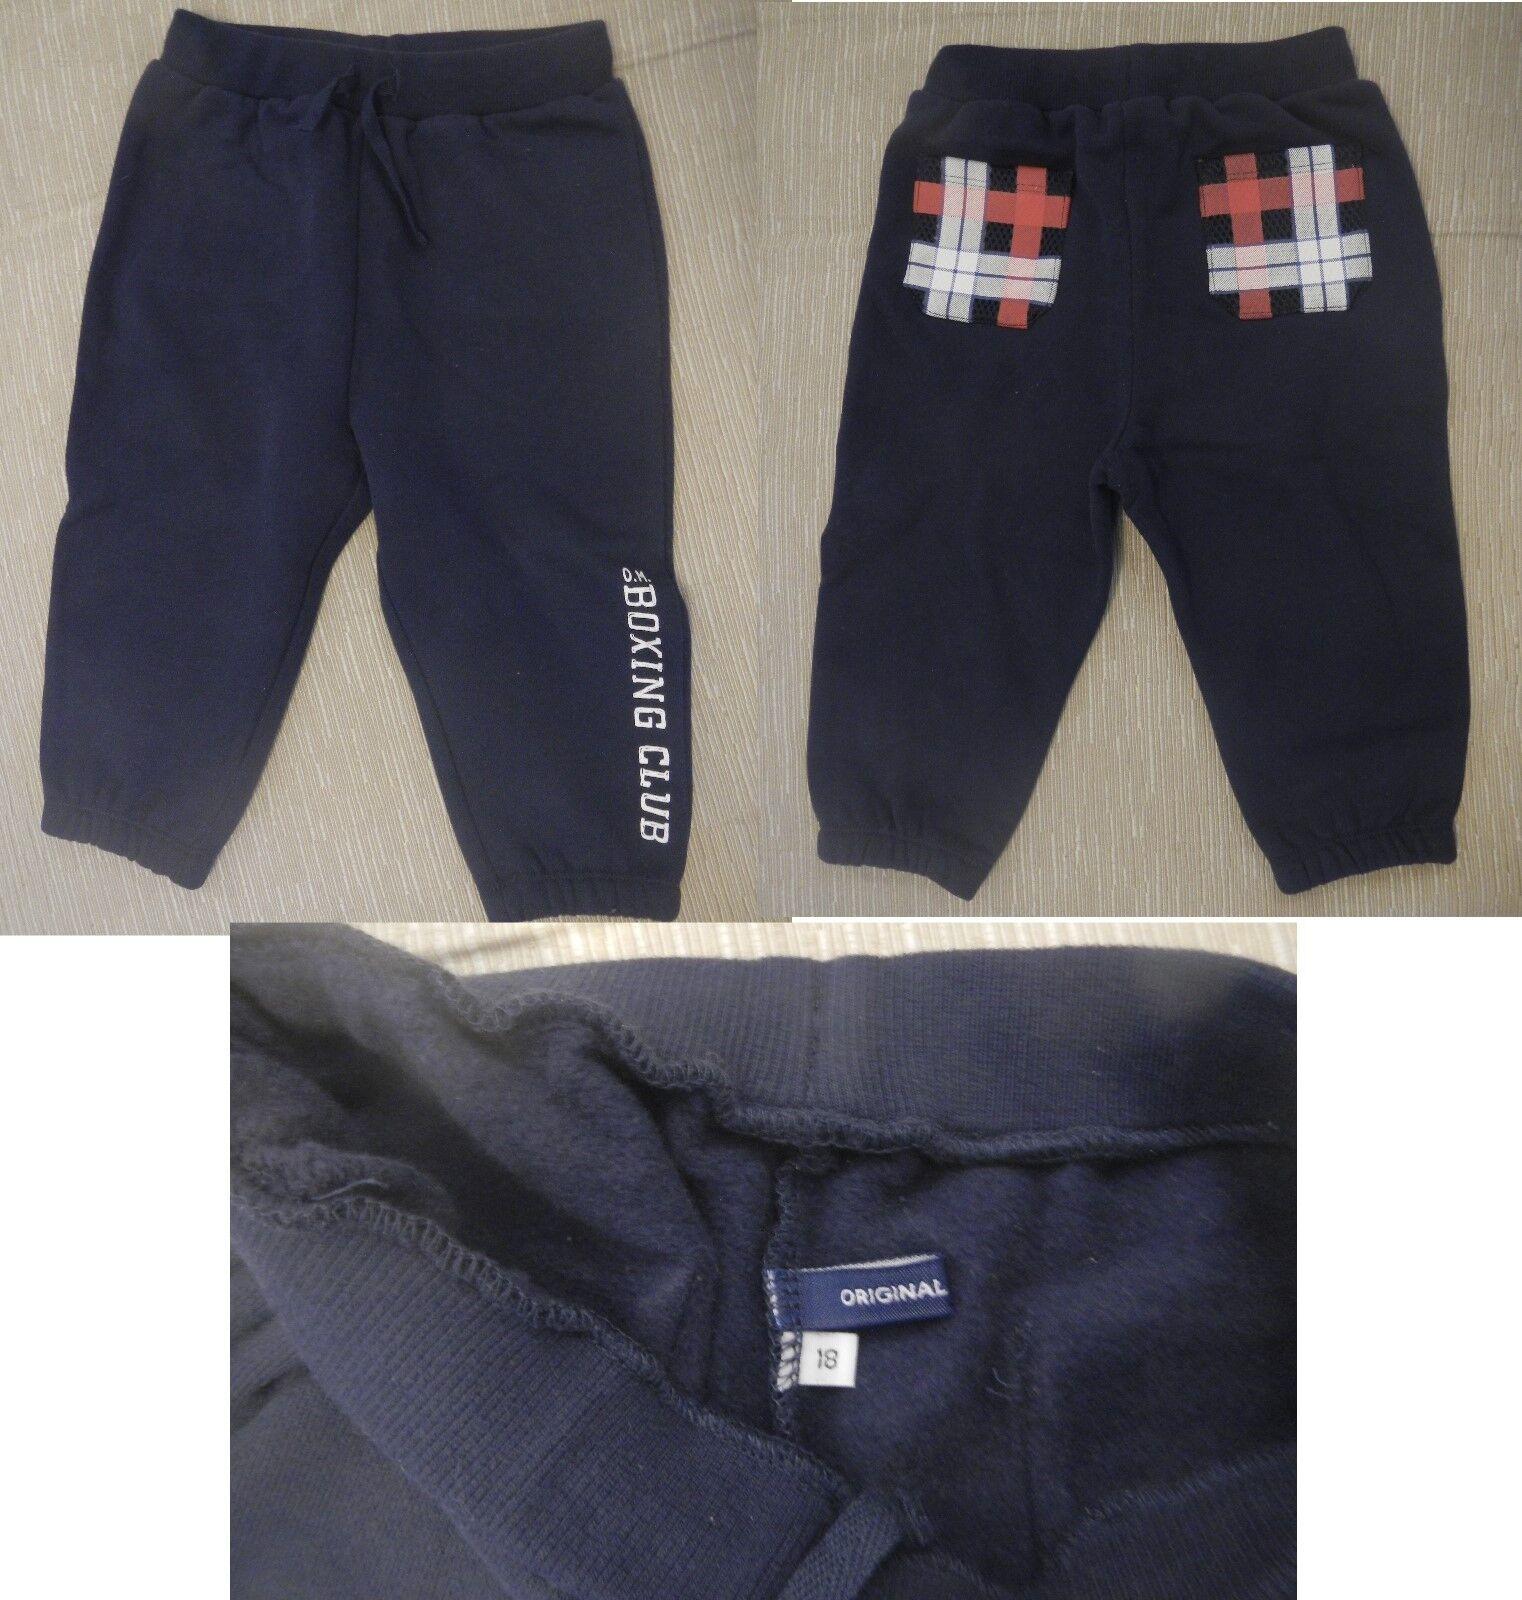 Pantaloni Ginnici Blu Original Marines Boxing Club 18 Mesi  - 8,00€